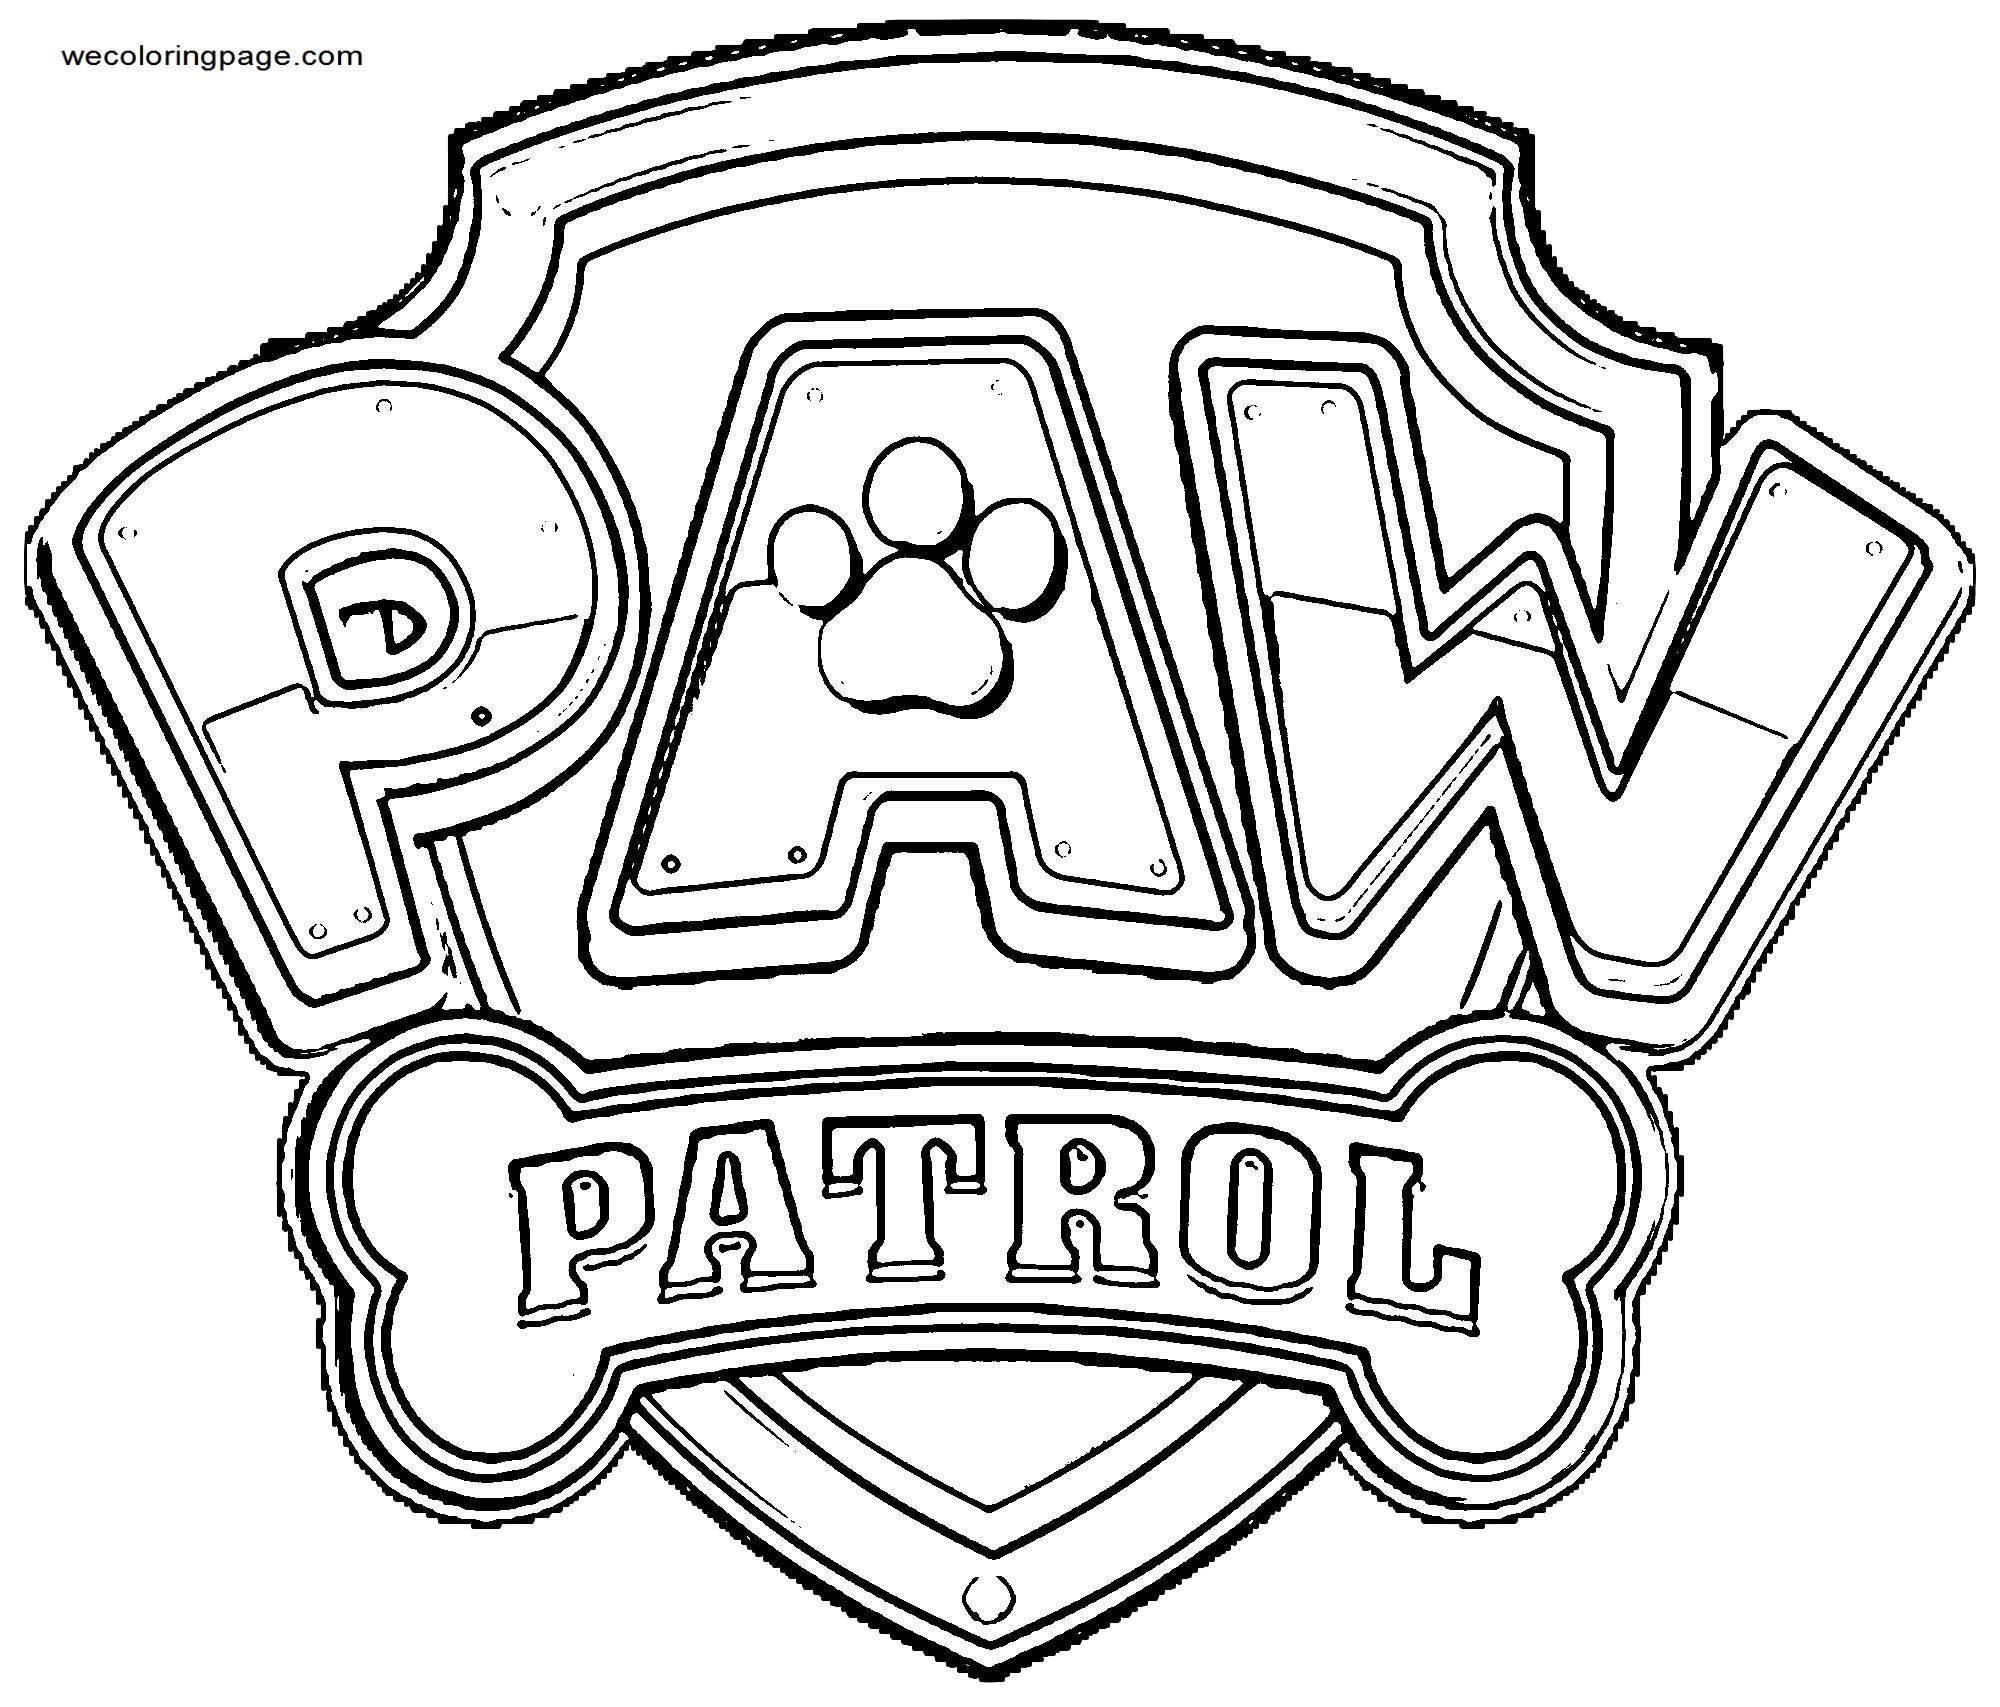 Pawpatrollogo Coloring Page